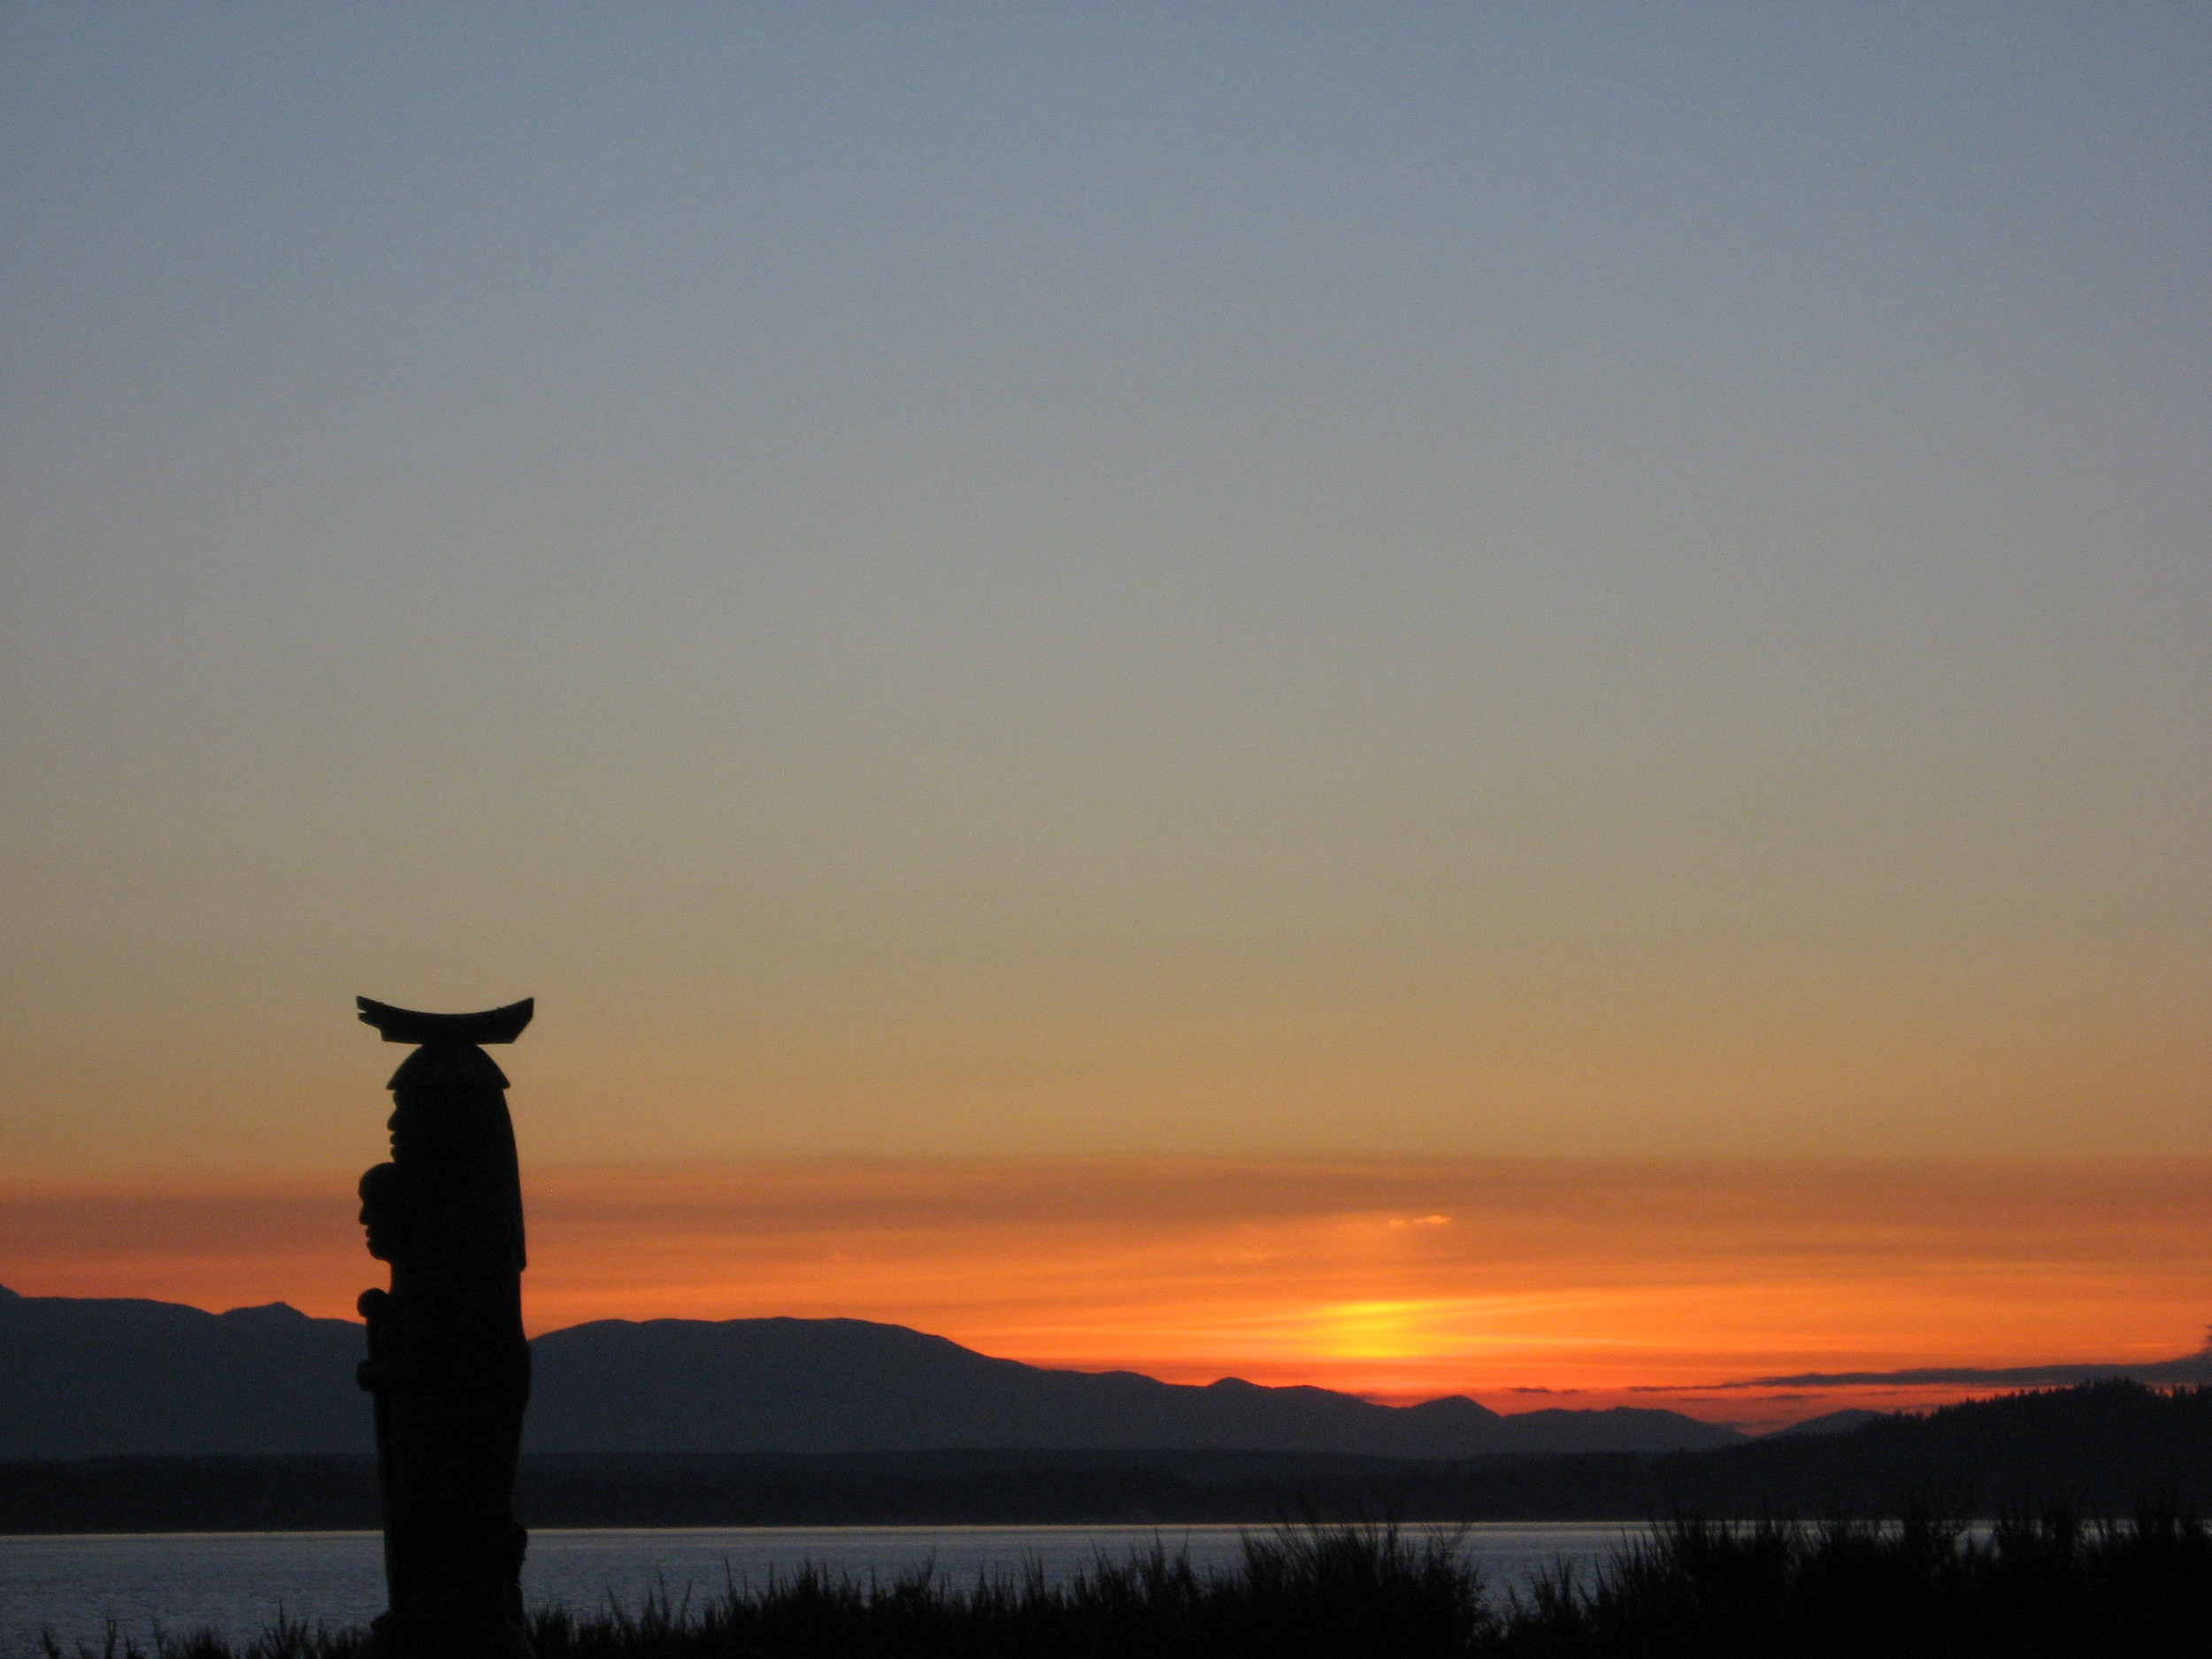 sunset with totem.JPG